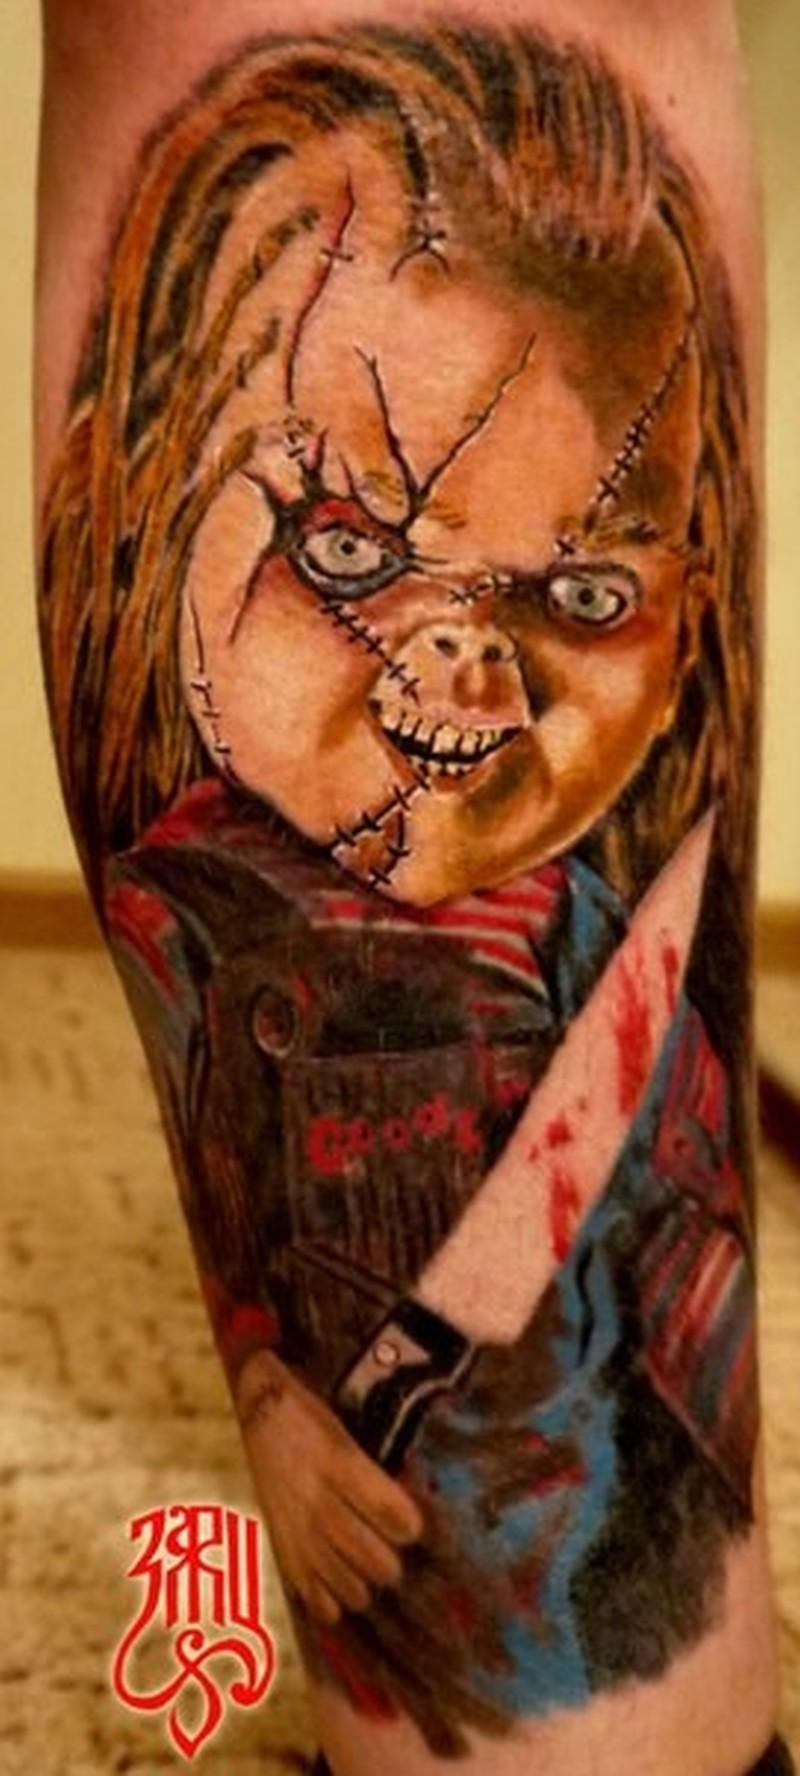 Bloodthirsty chucky movie horror tattoo on leg